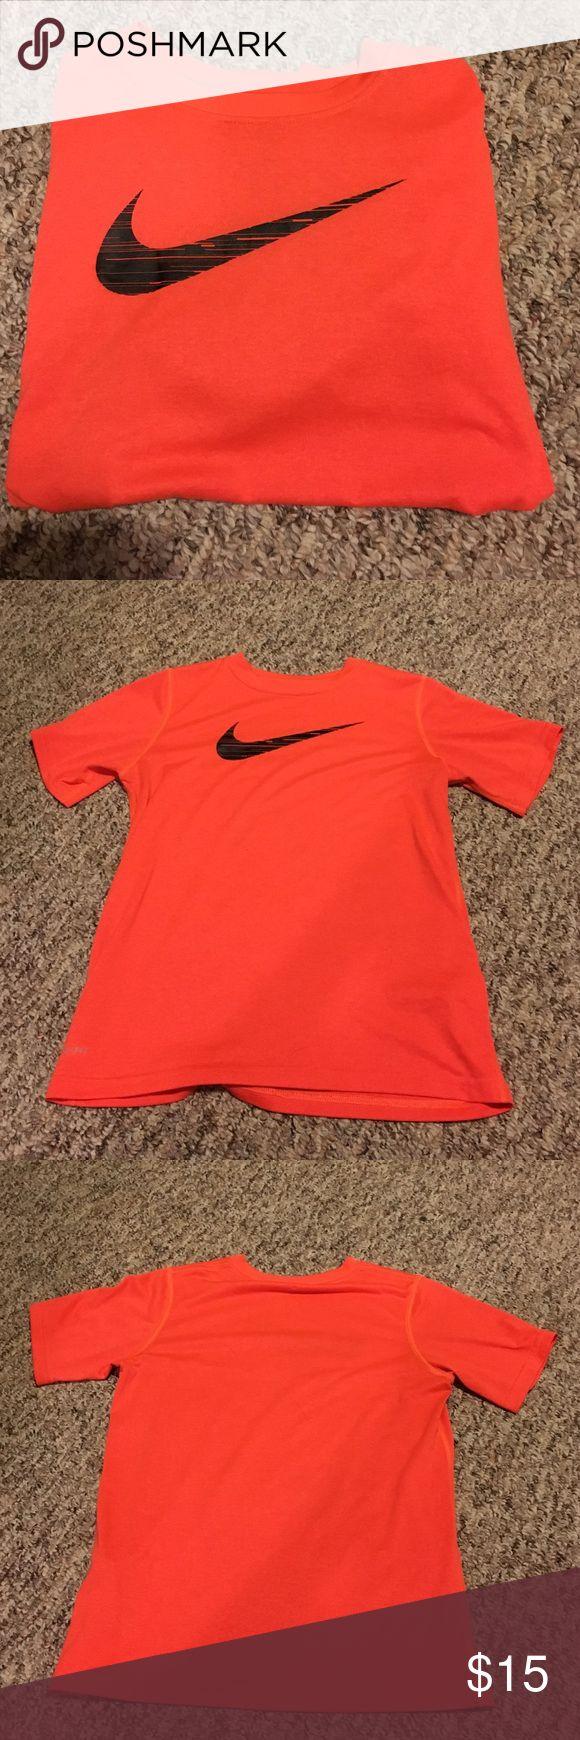 Nike boys medium orange tee Bright orange, worn once, doesn't fit. Damage free! Smoke free home Nike Shirts & Tops Tees - Short Sleeve